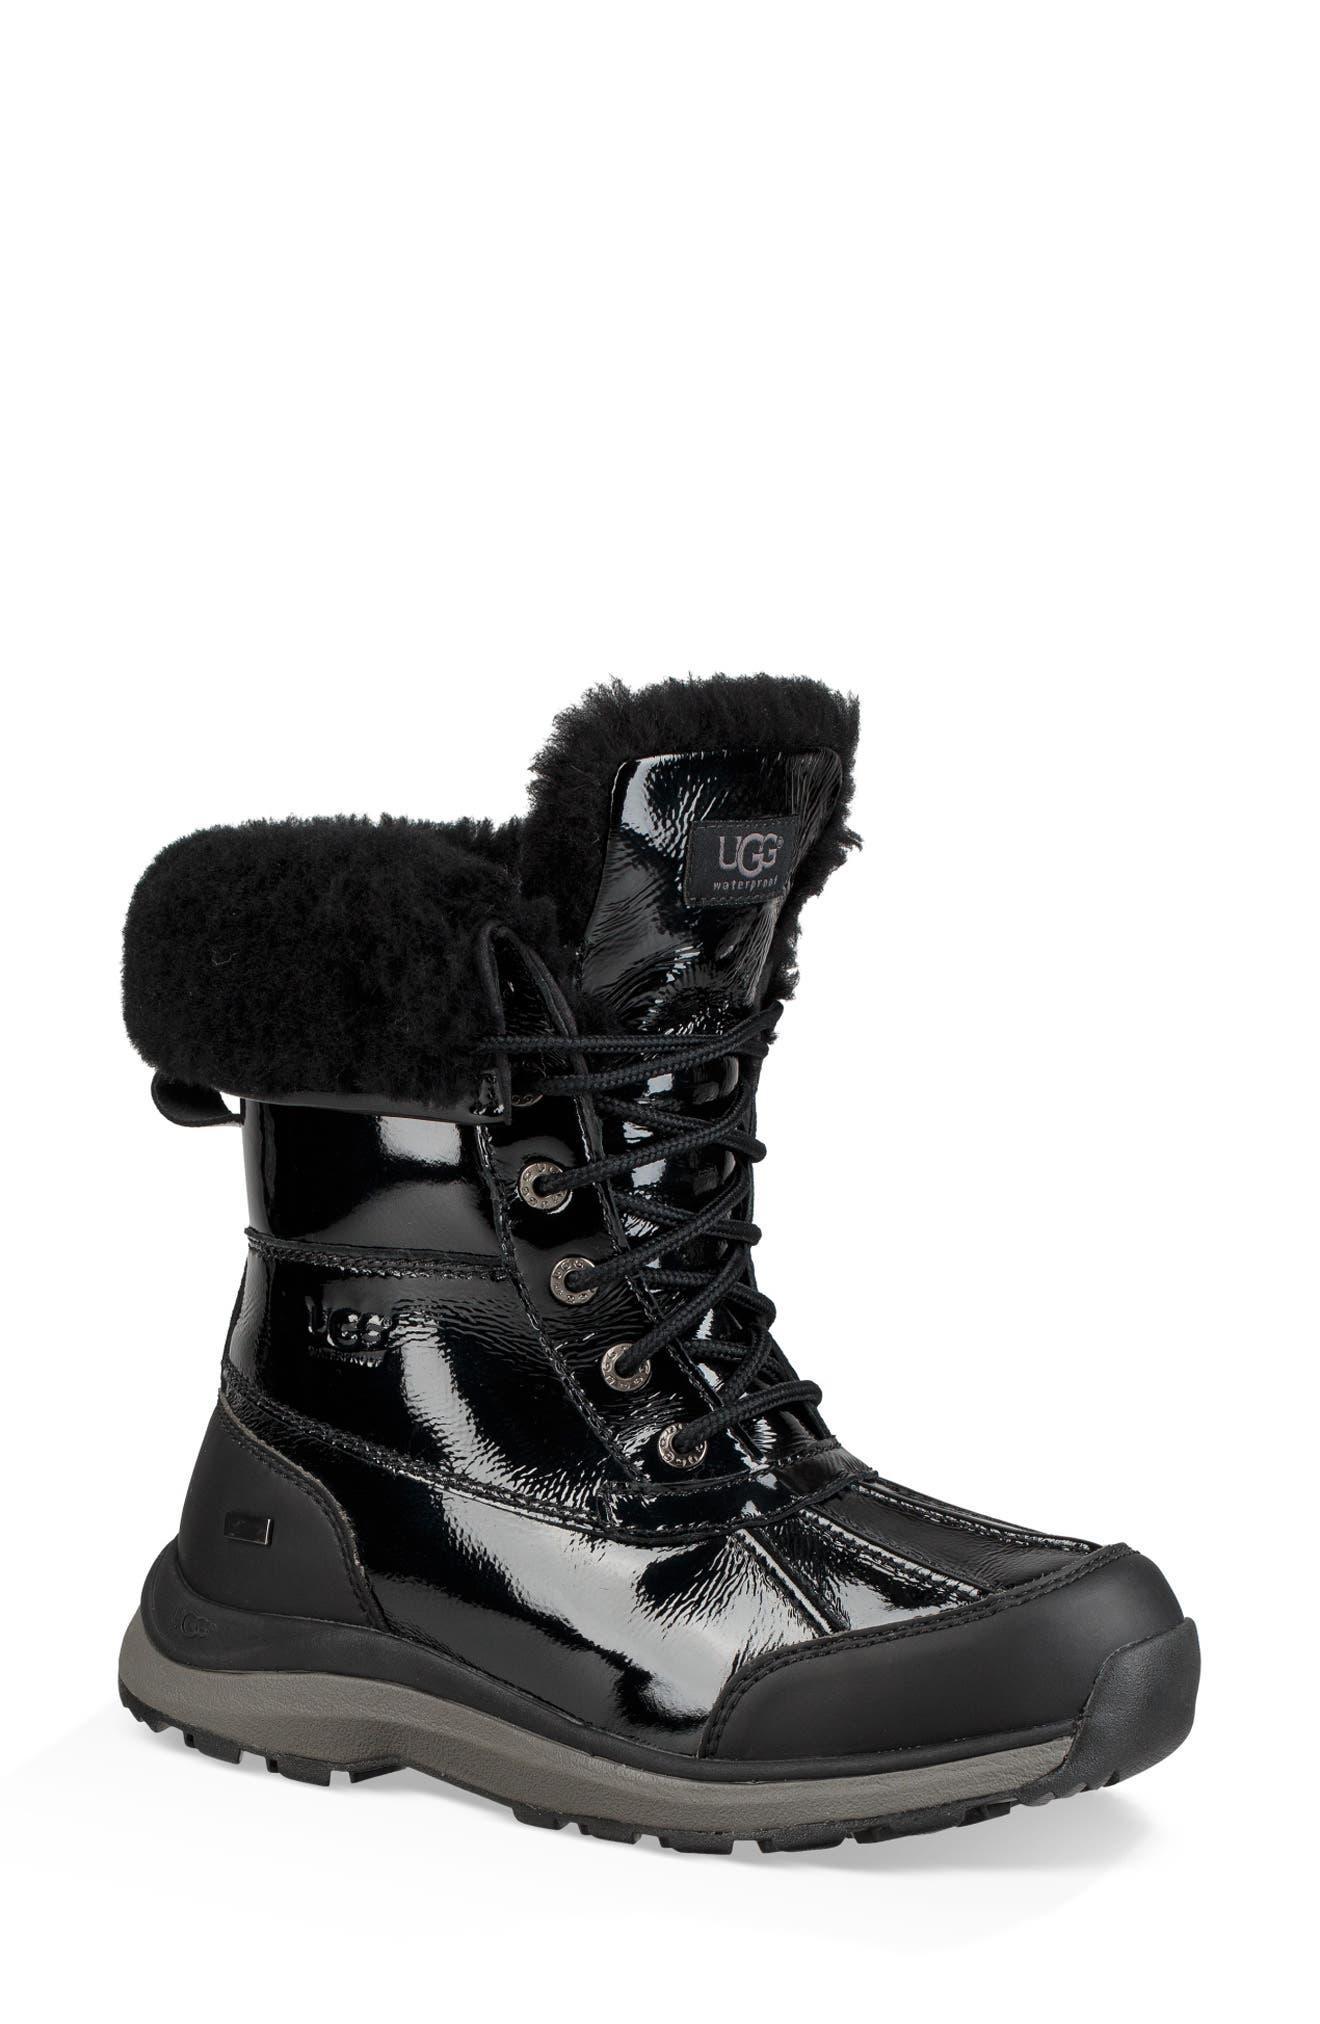 Adirondack III Waterproof Insulated Patent Winter Boot,                         Main,                         color, BLACK